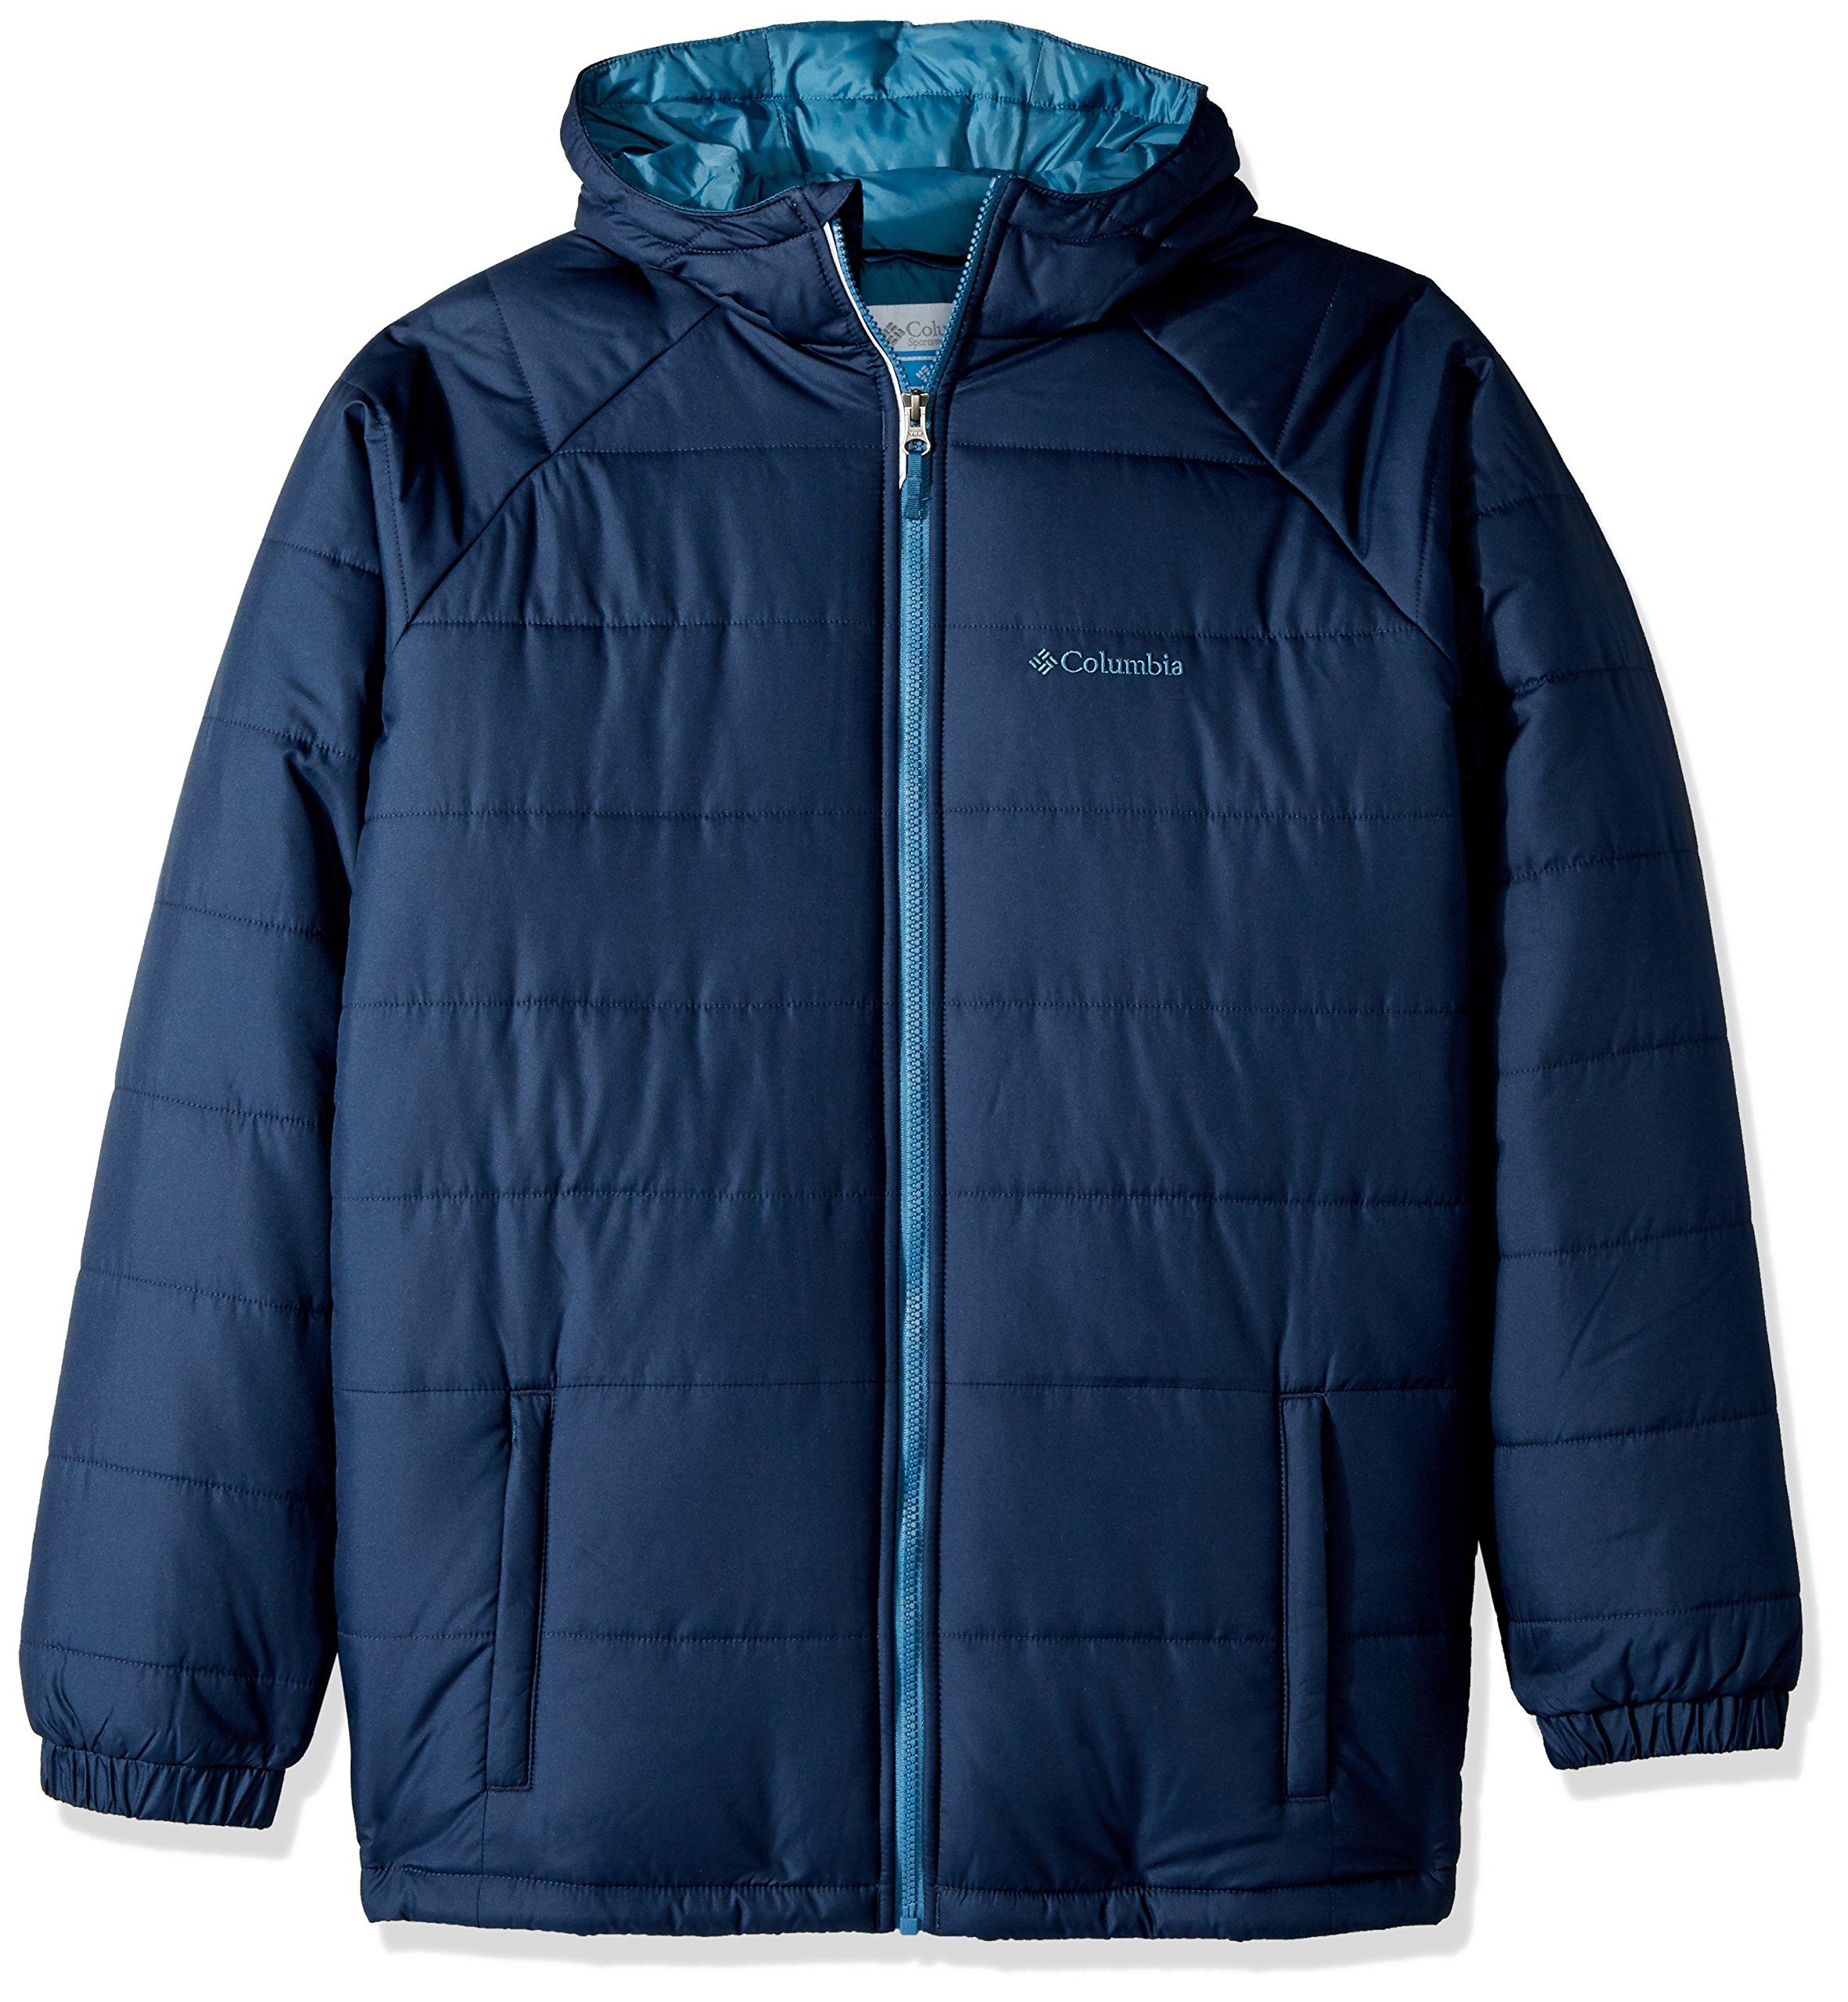 Columbia Boys' Big Tree Time Puffer Jacket, Collegiate Navy, Medium